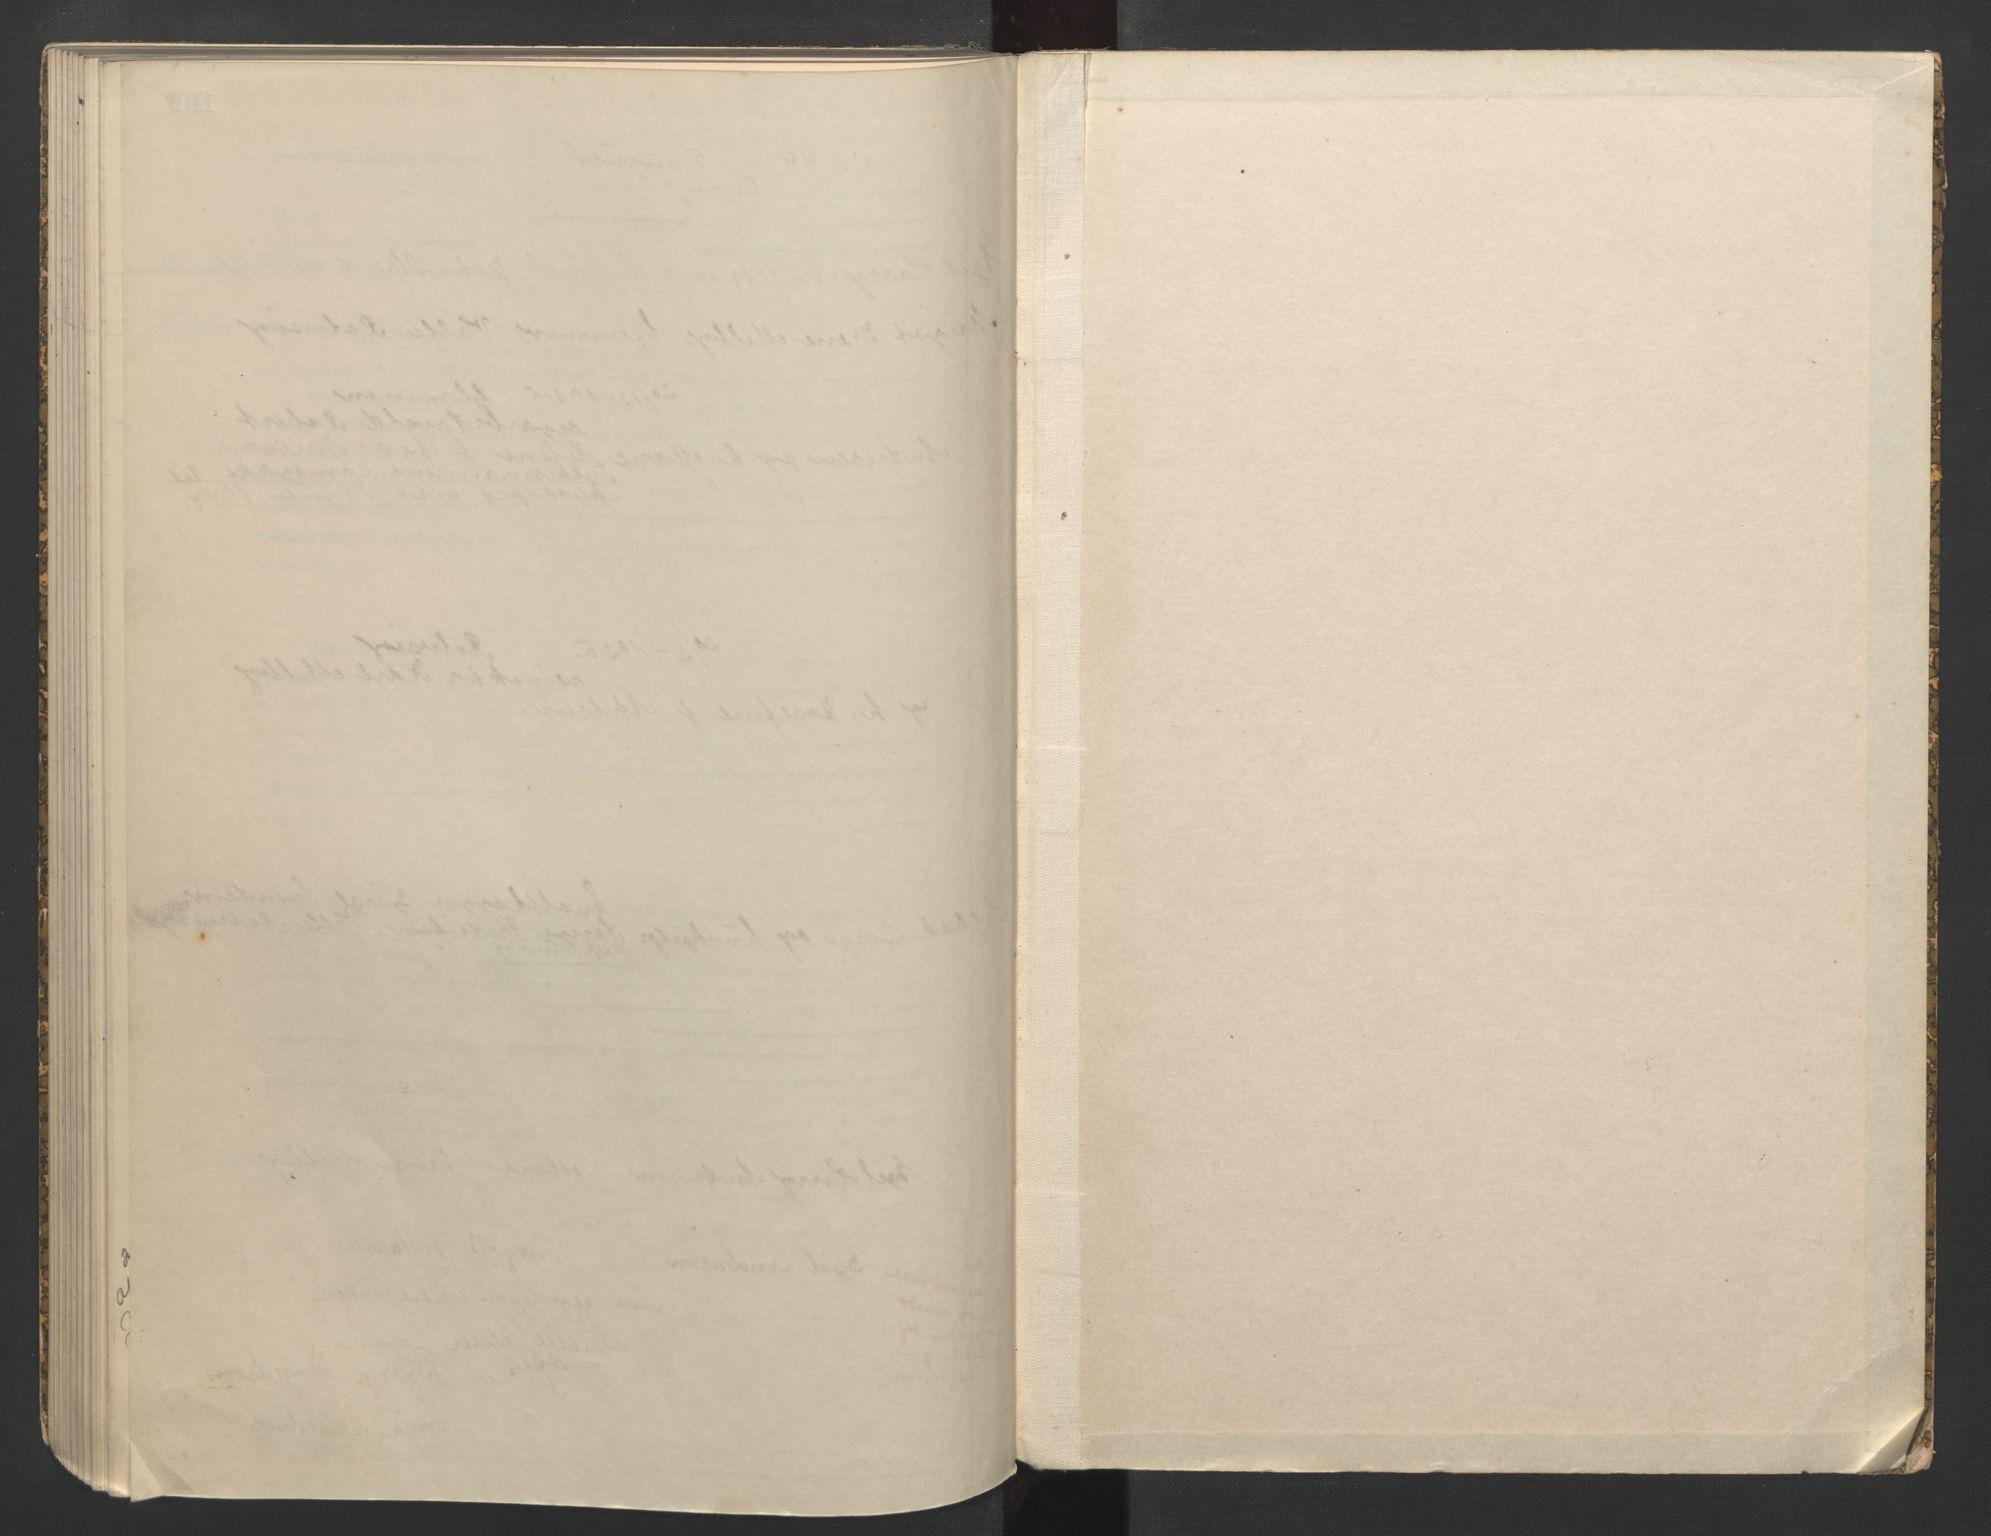 SAO, Onsøy sorenskriveri, L/La/L0004: Vigselsbok, 1943-1944, s. upaginert